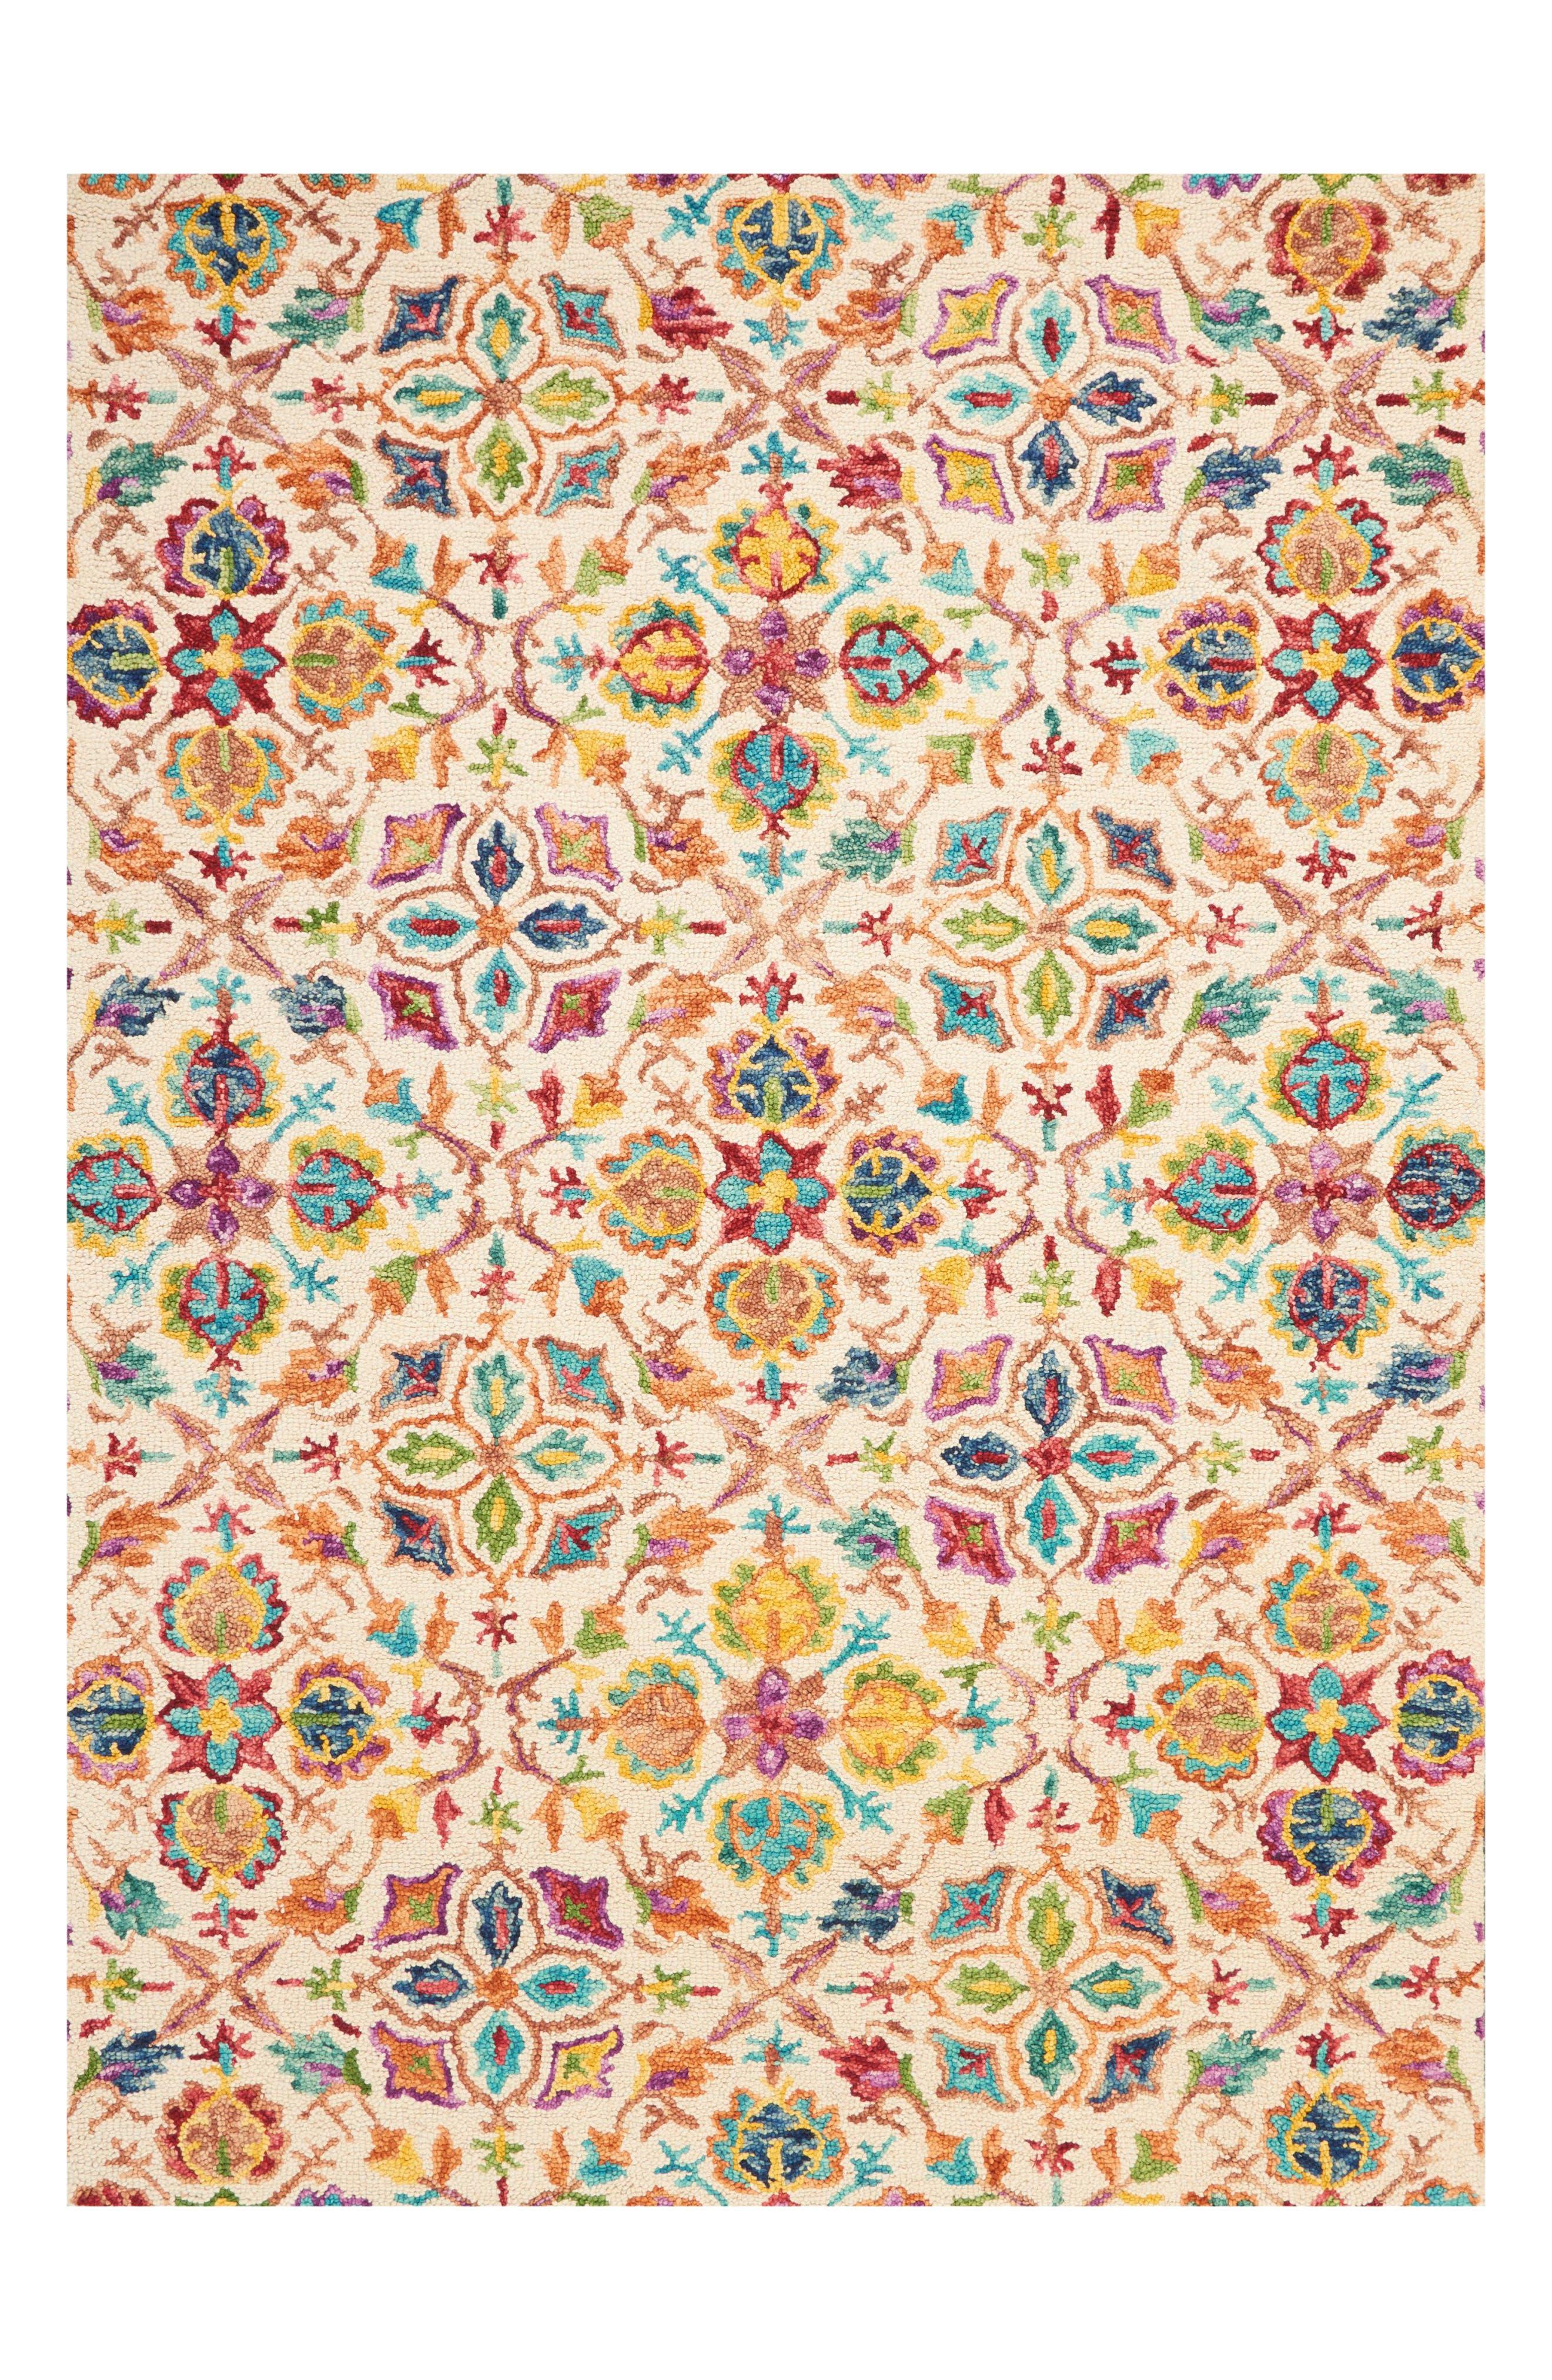 Alternate Image 1 Selected - Nourison Vivid Wool Rug